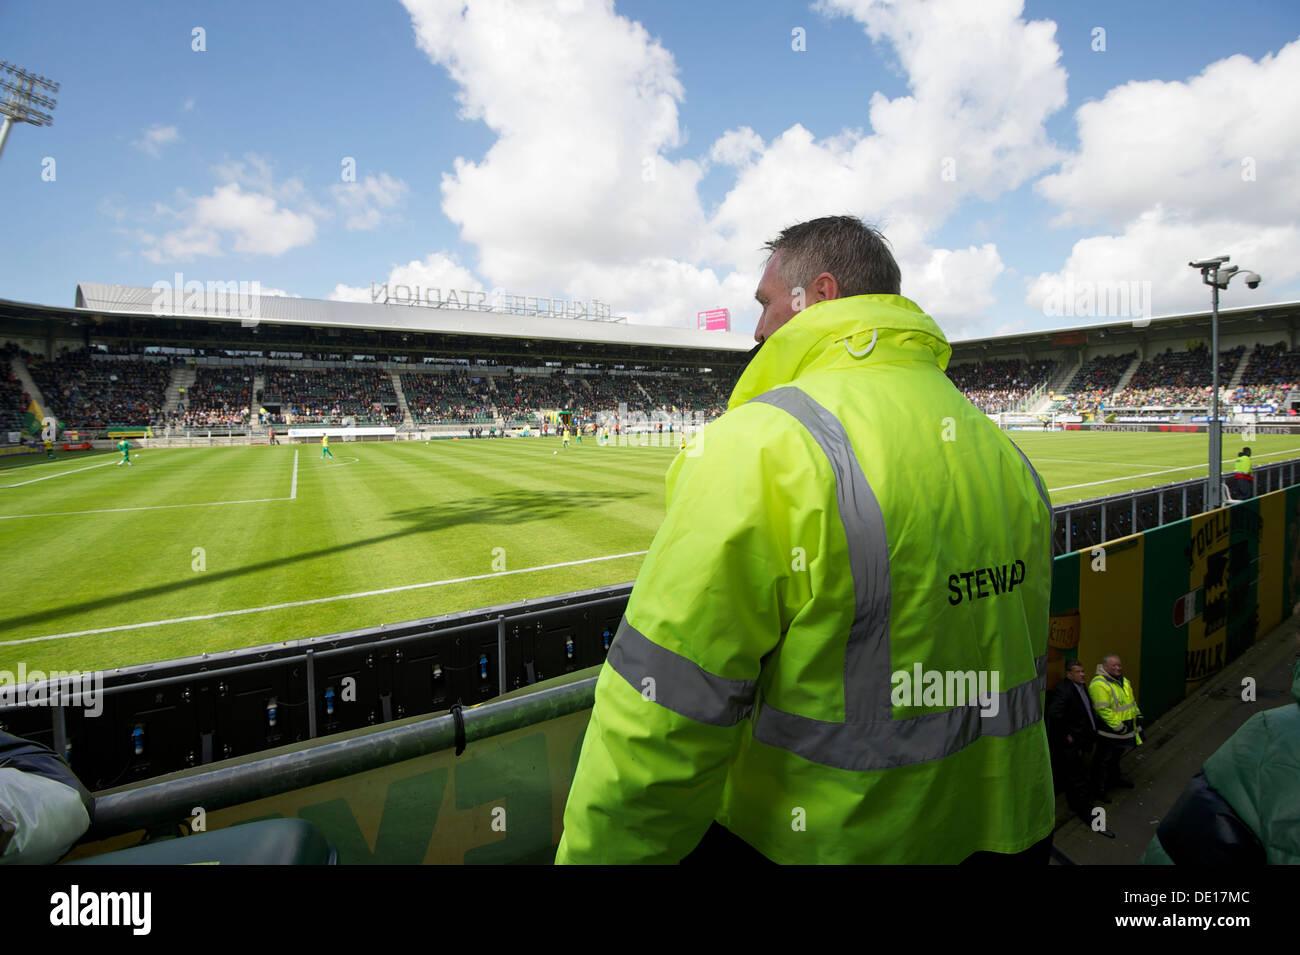 Holland-The Hague. 22-04-2012. Security at soccer stadium of 'Ado den Haag'. Photo: Gerrit de Heus Stock Photo